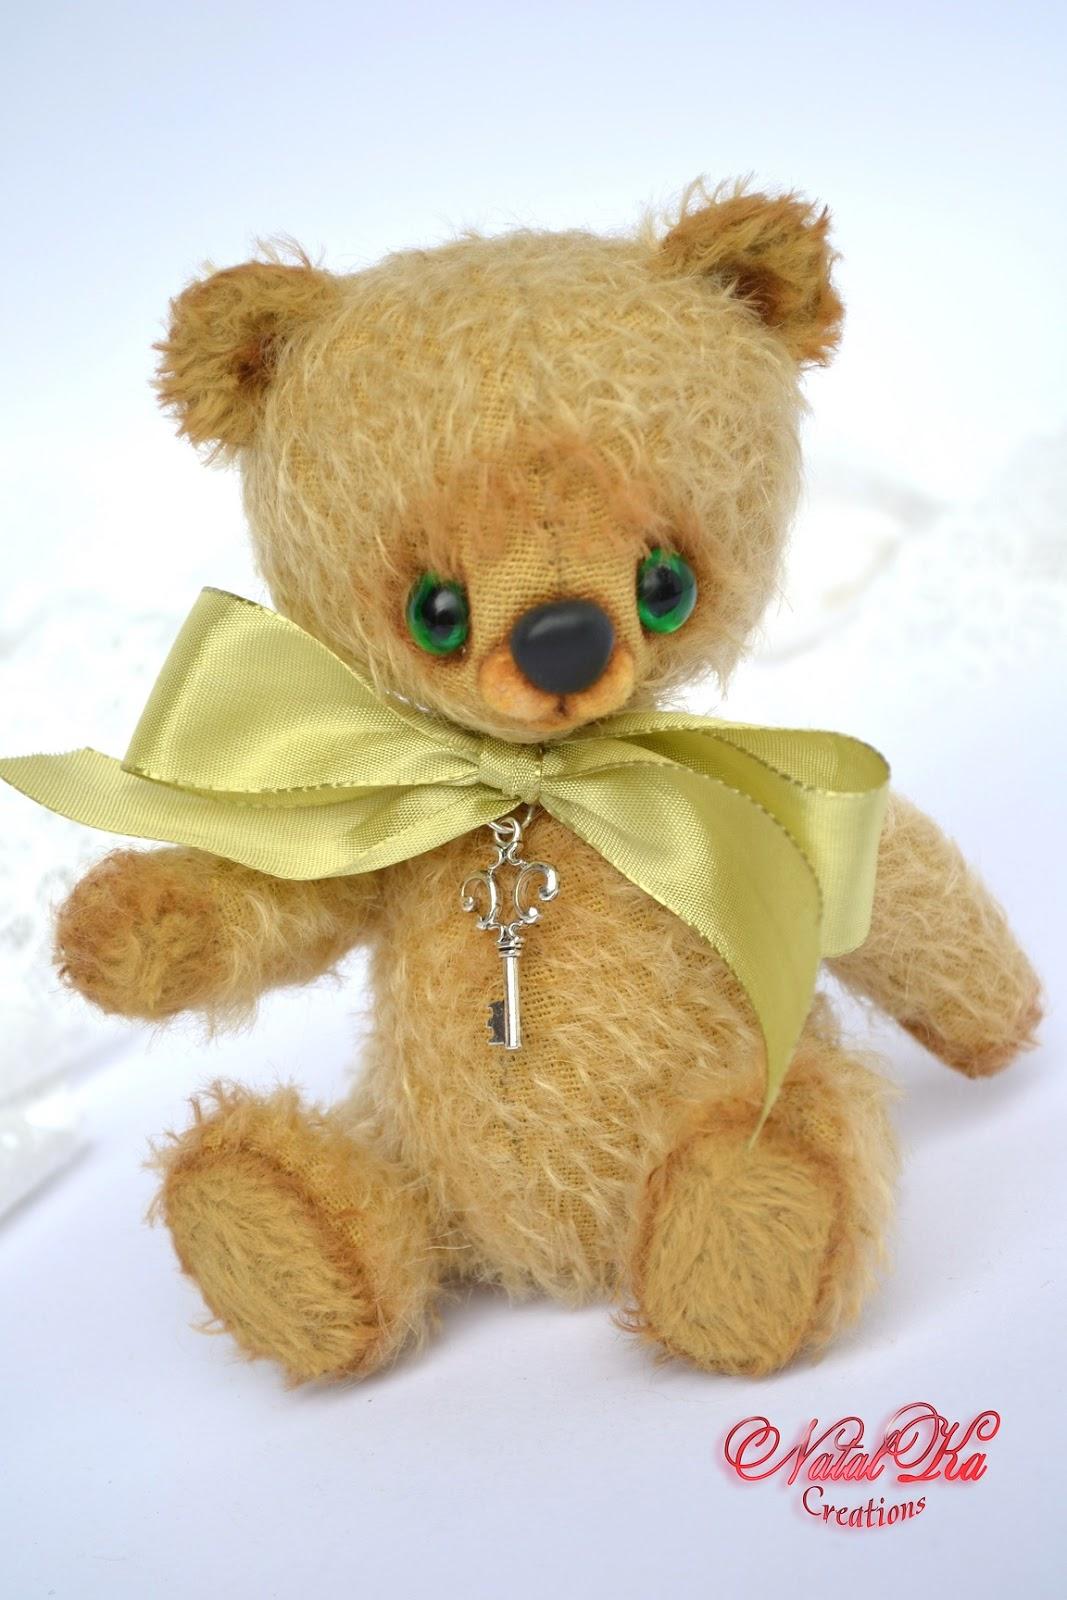 Artist teddy bear ooak handmade from mohair by NatalKa Creations. Künstlerbär Teddy Unikat handgemacht aus Mohair von NatalKa Creations.